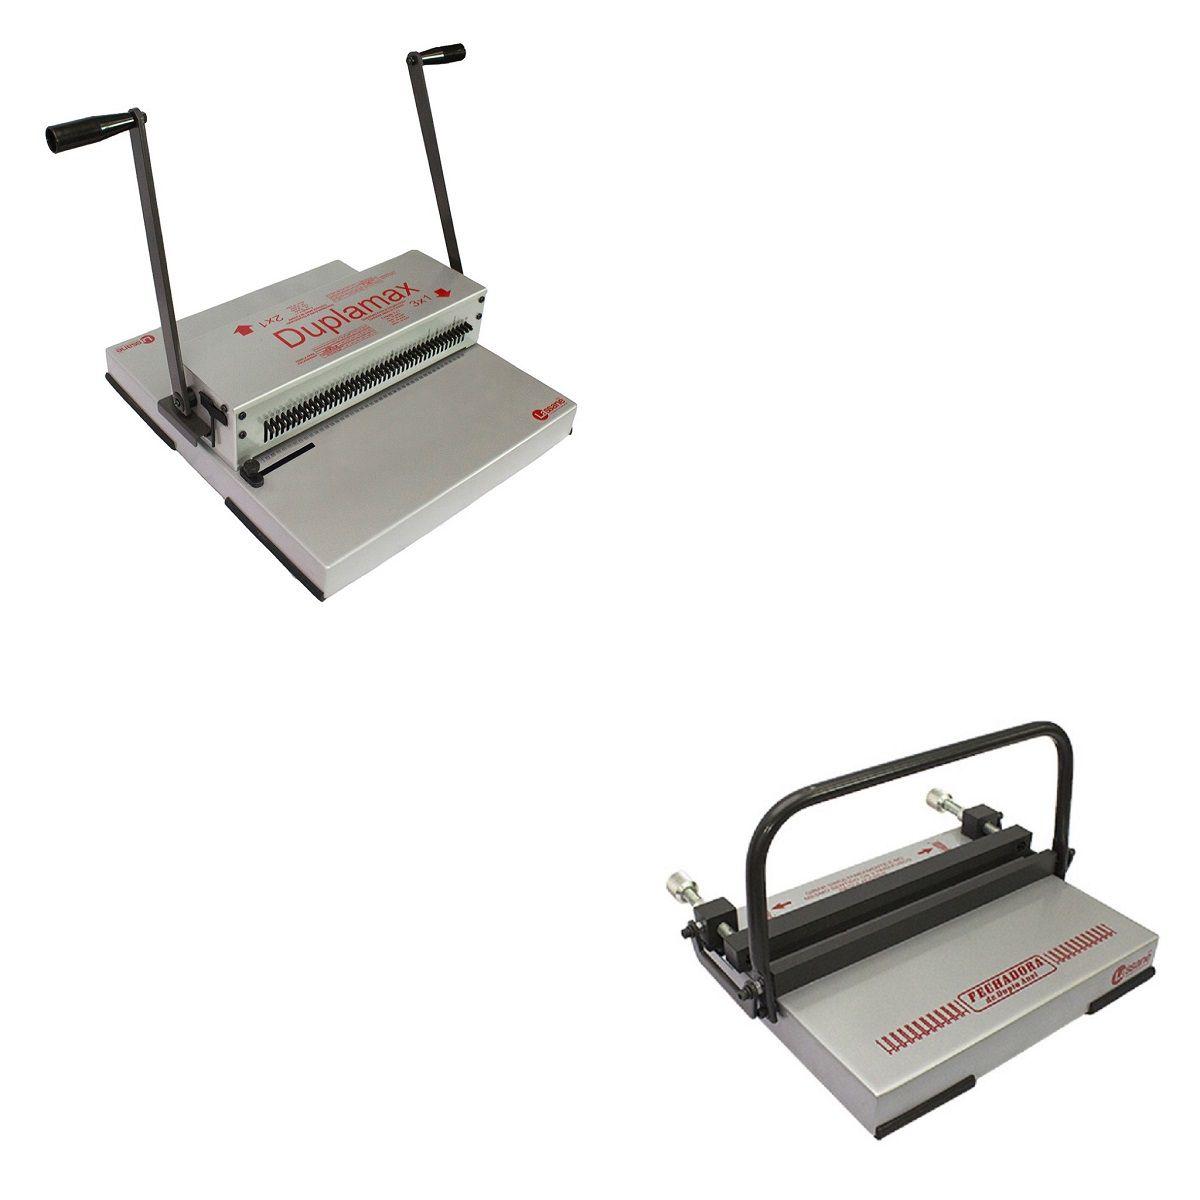 Kit Encadernadora Duplamax + Fechador Wire-o 35cm Lassane  - Click Suprimentos